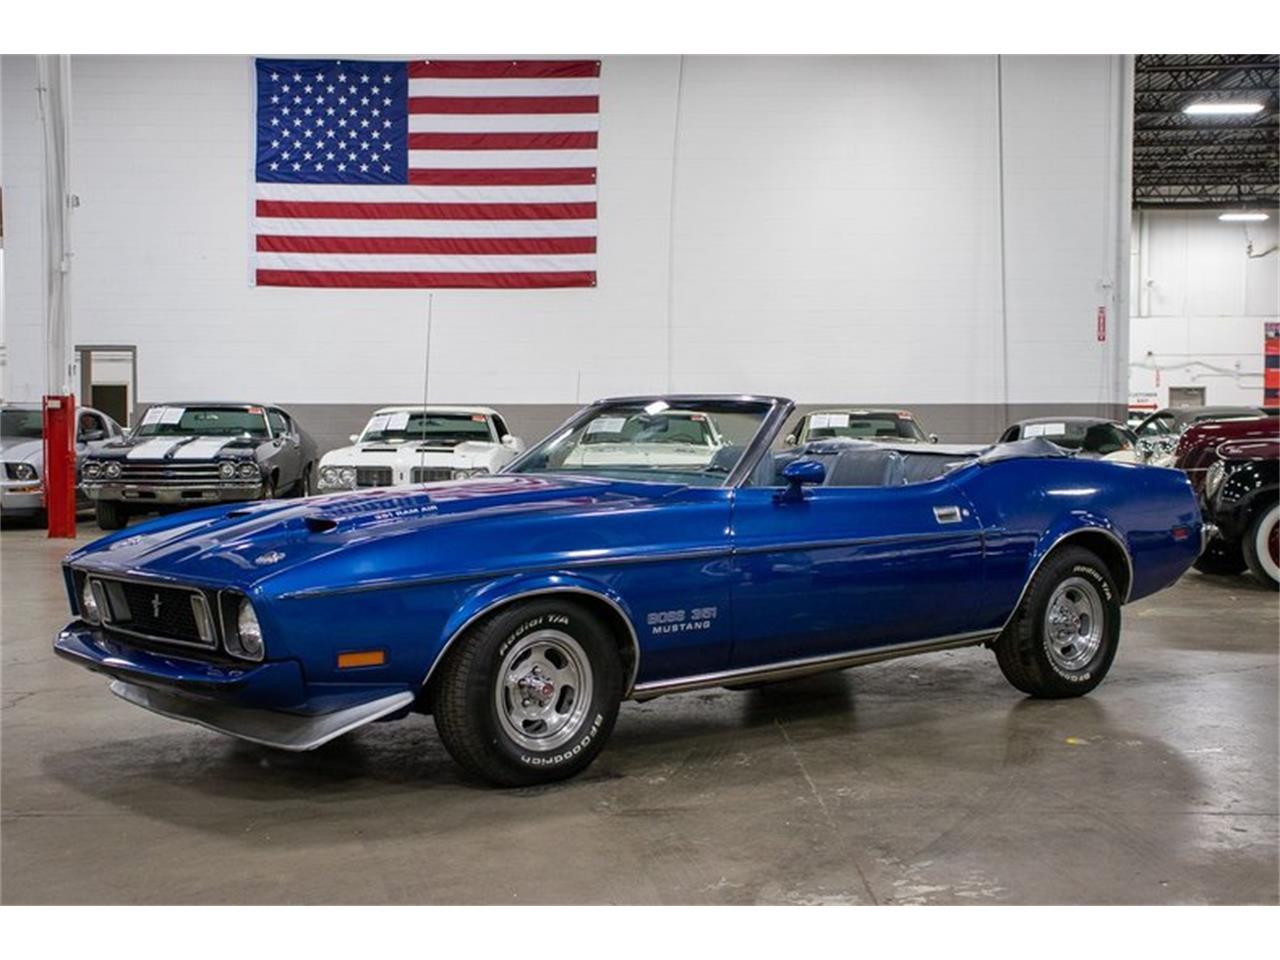 Ford Mustang V8 1973 prix tout compris 1973